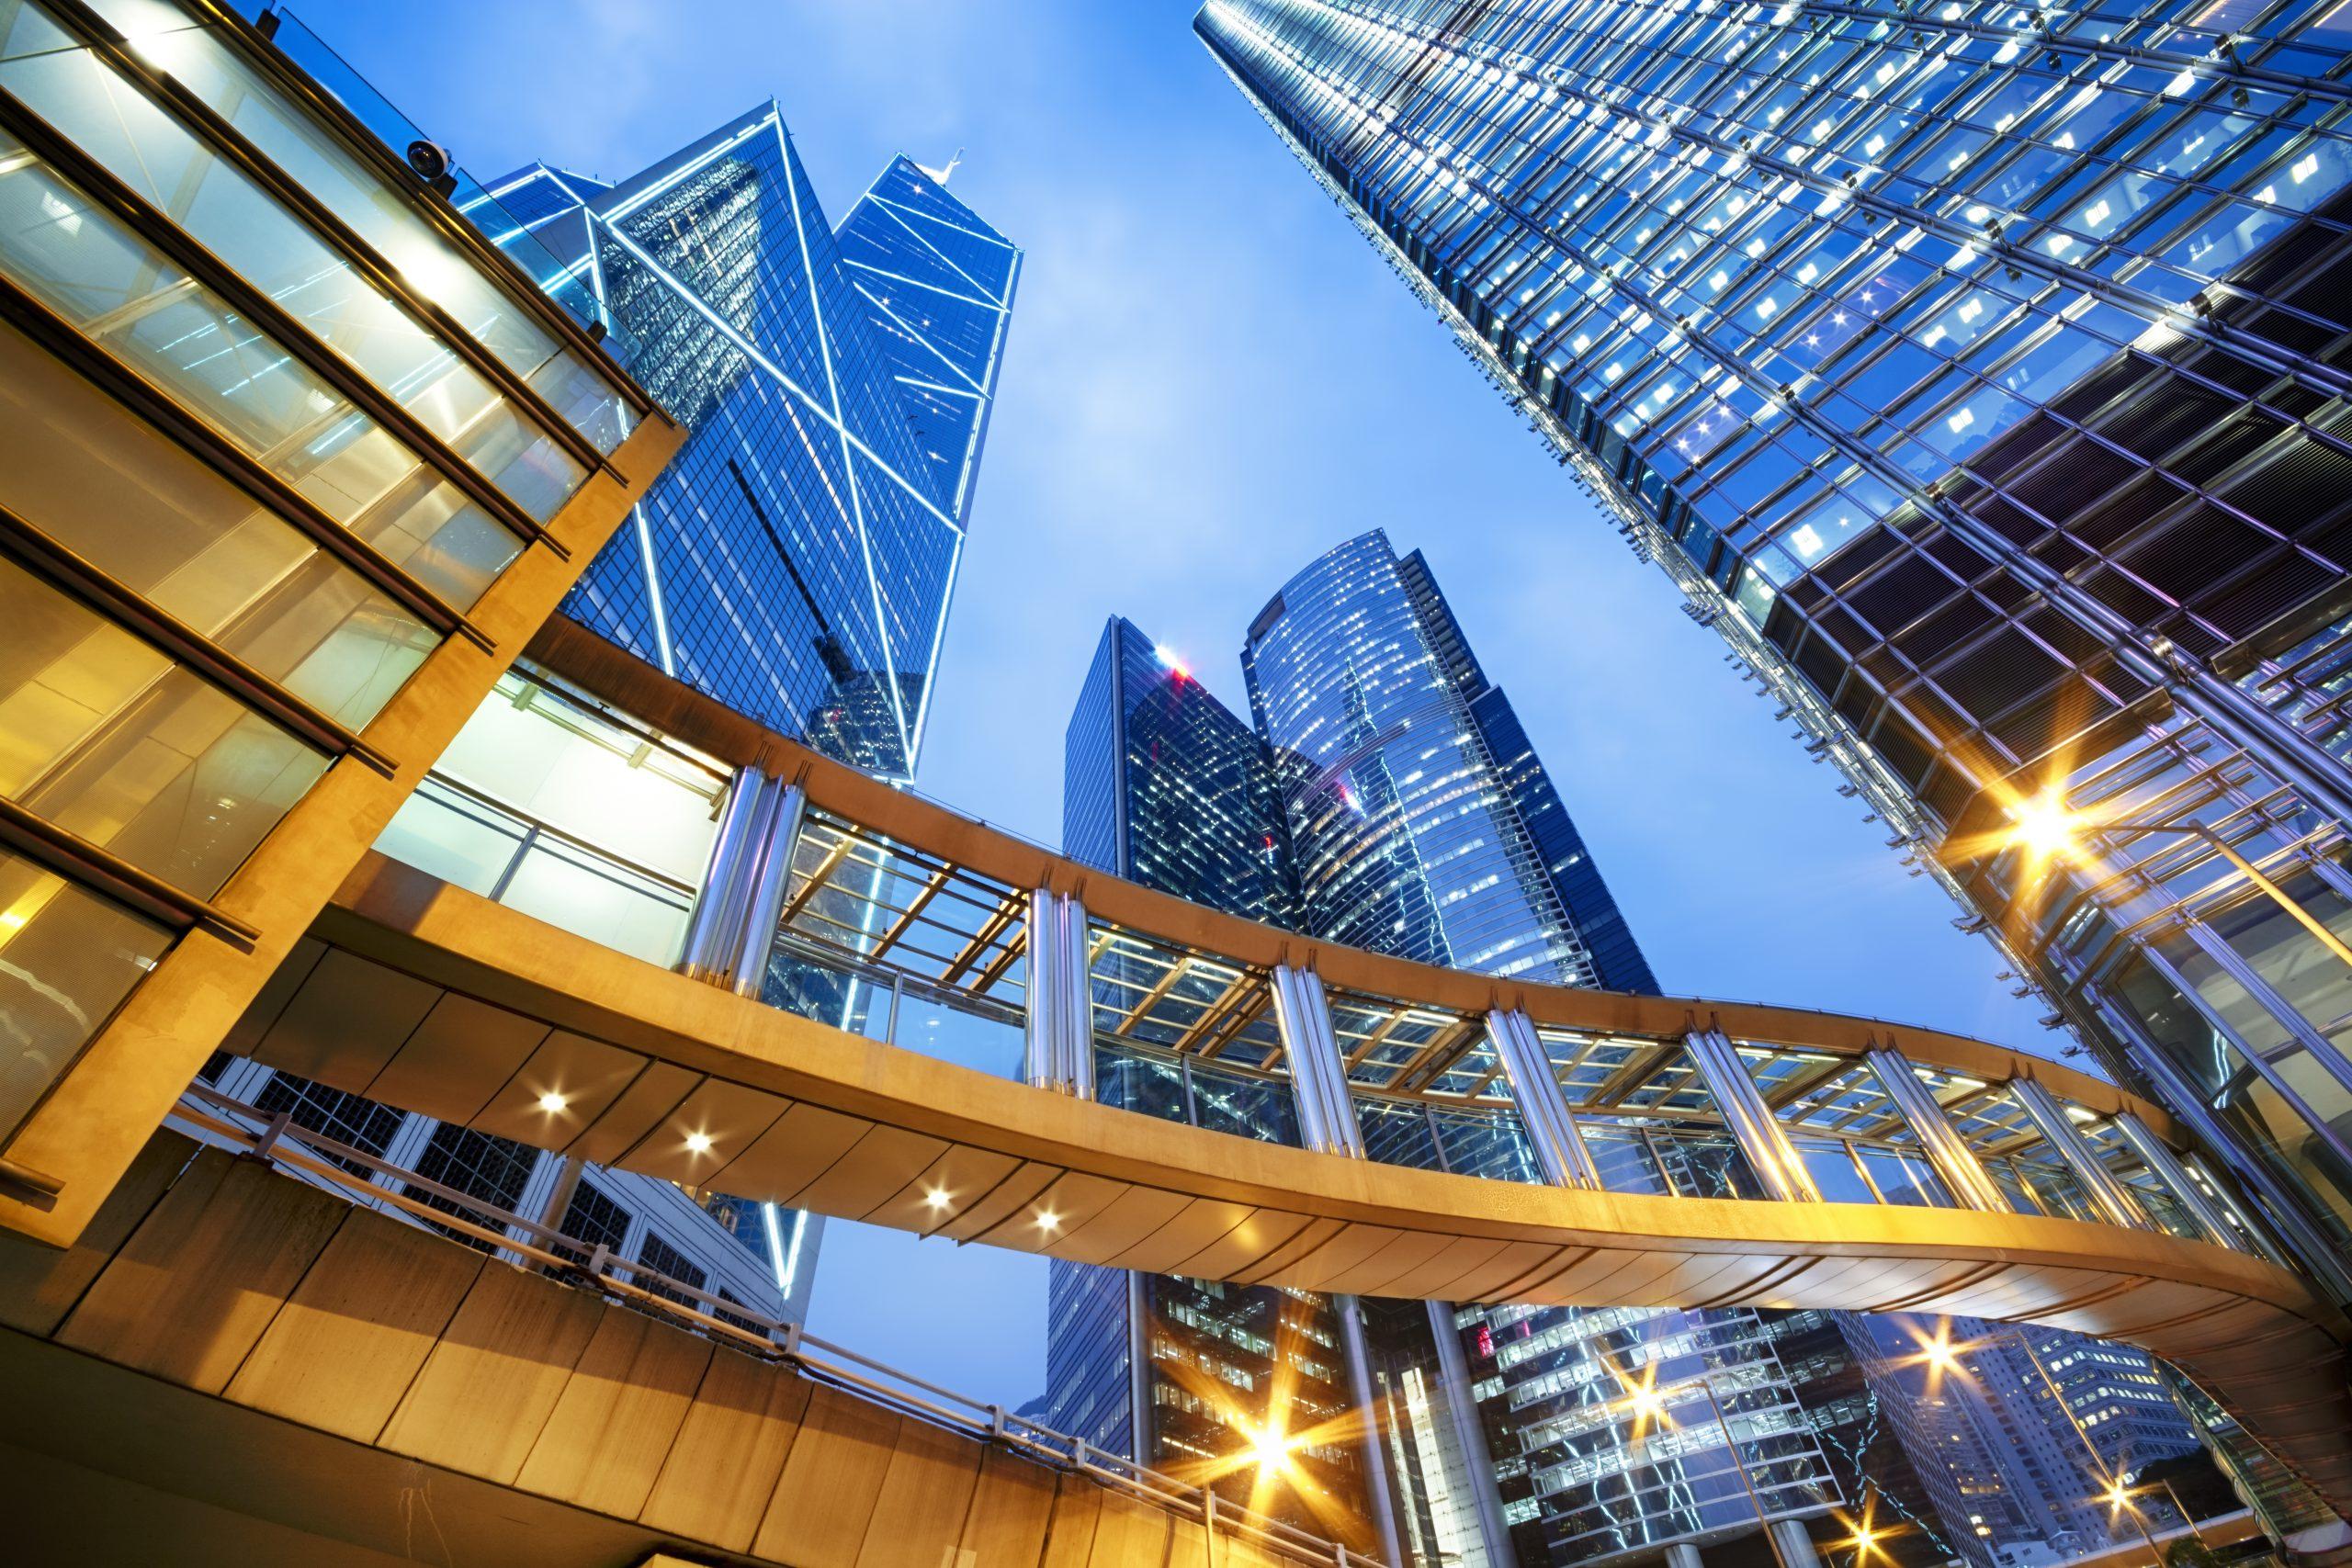 rmda-ss-finance-office-buildings-modern.6000.4000